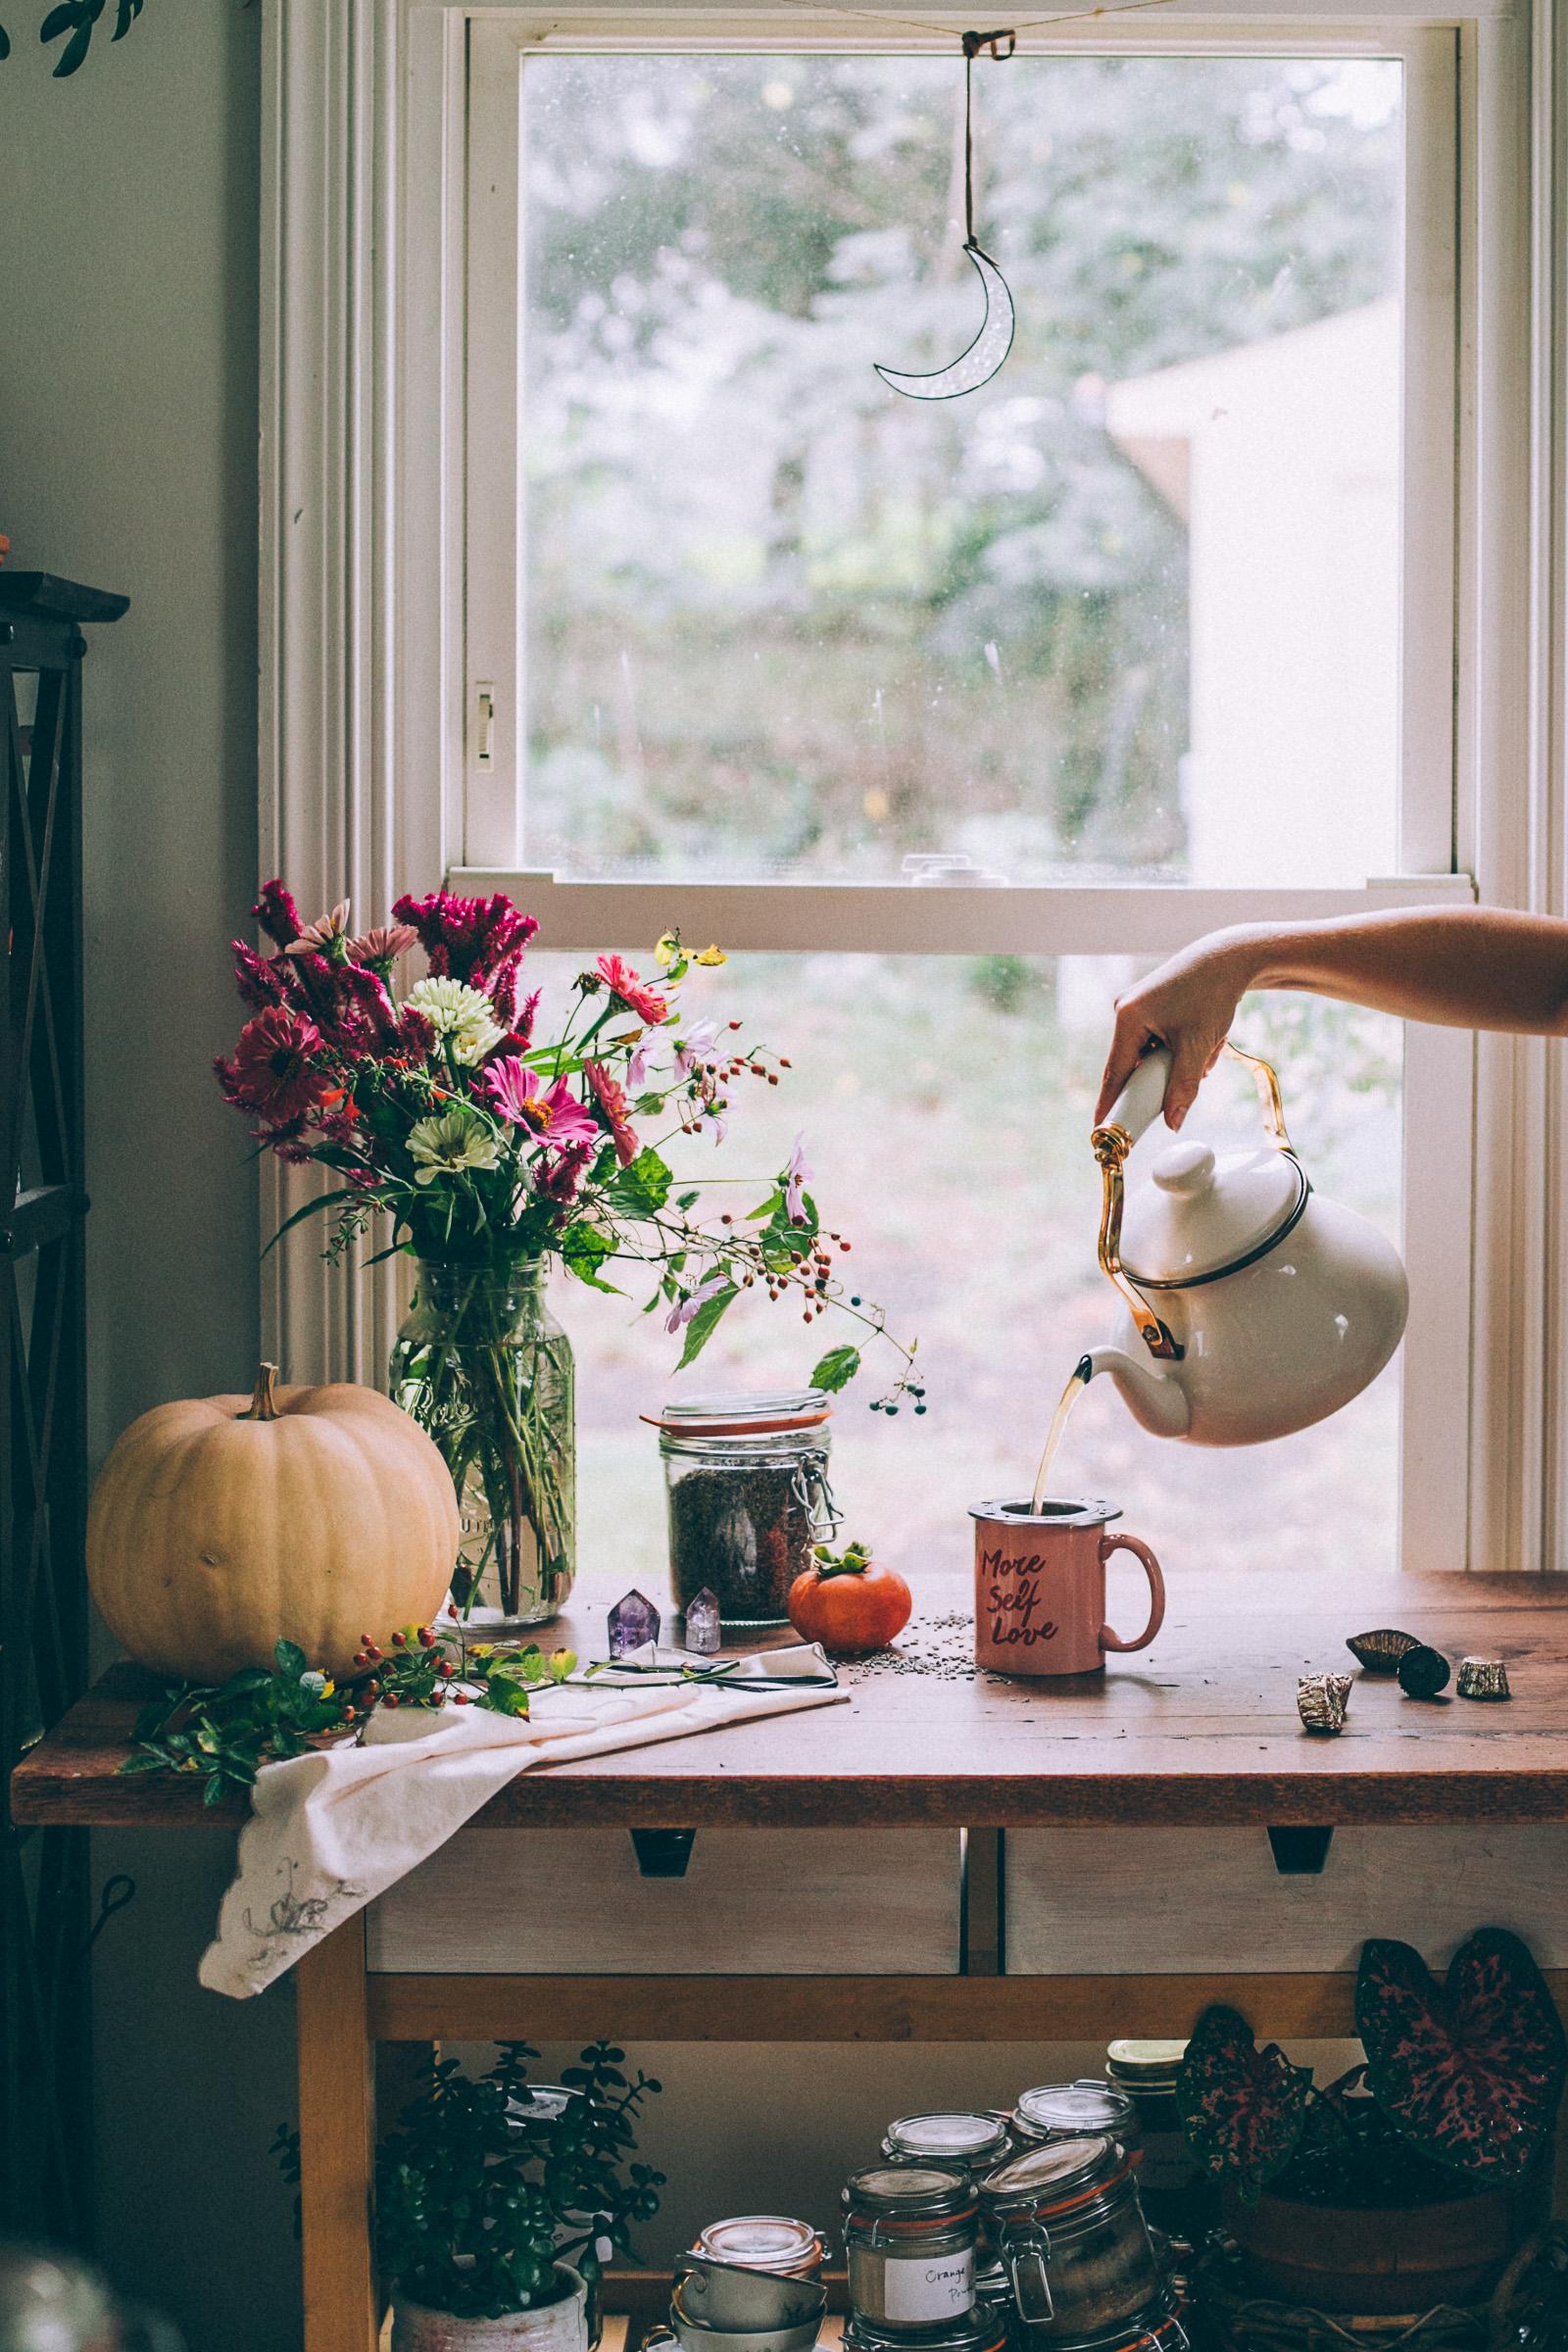 chai-tea-october-10-2018-self-love-7108.jpg